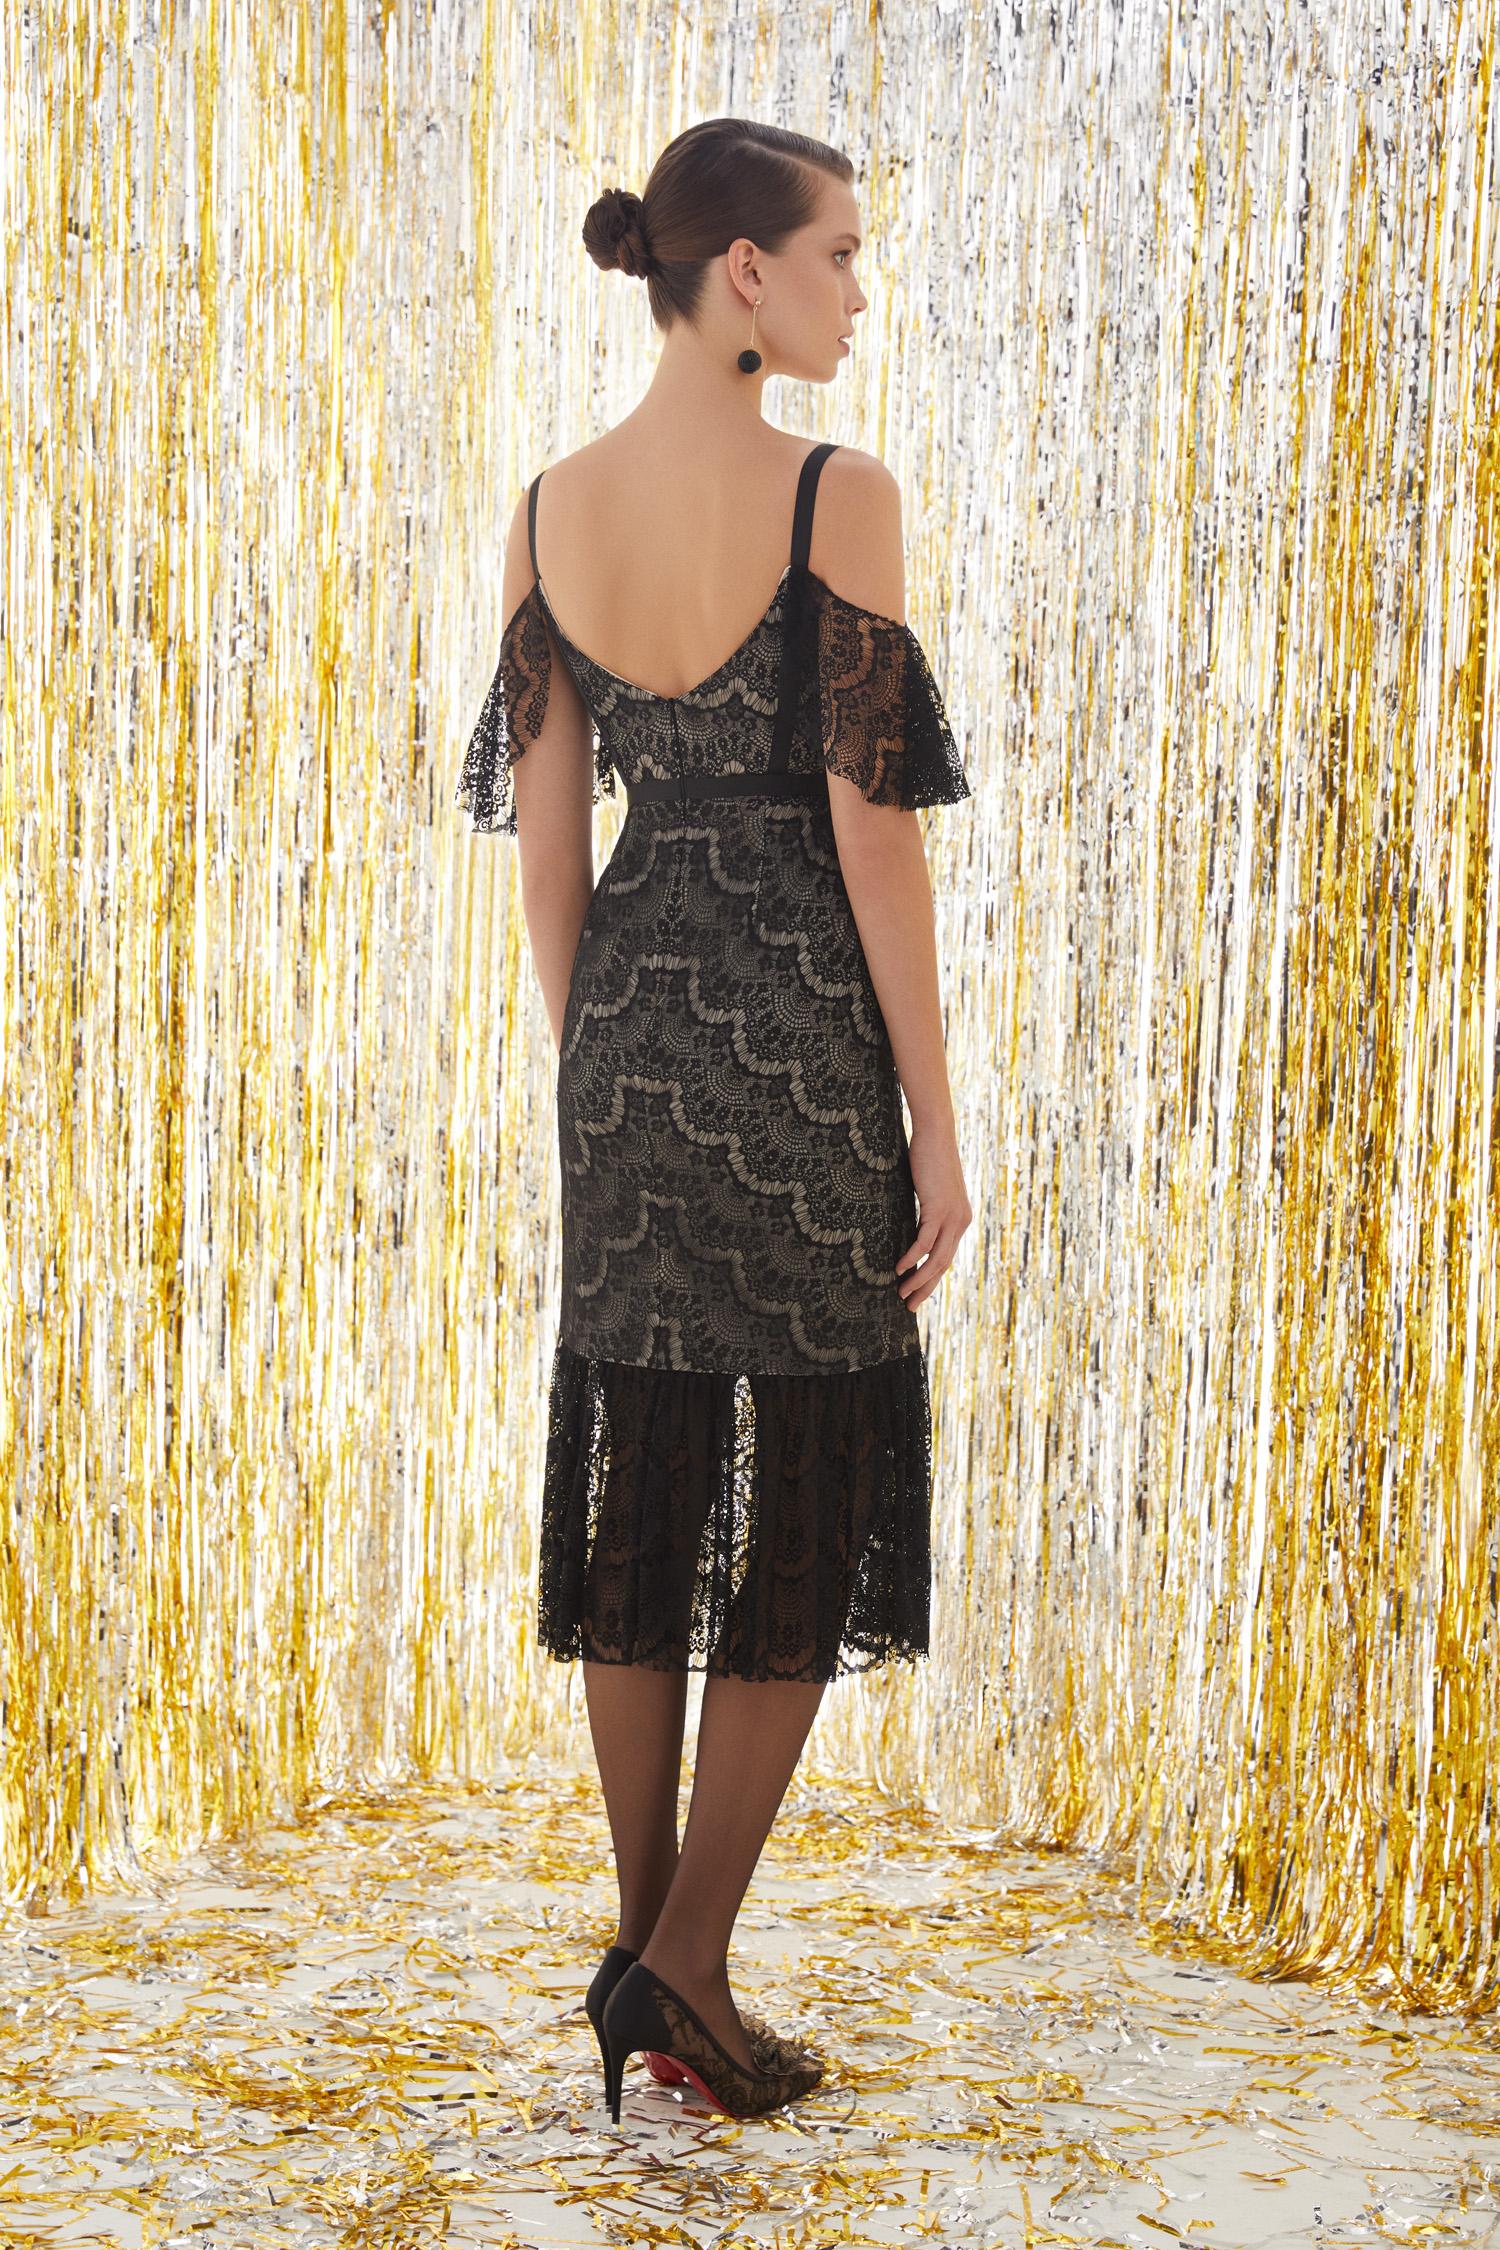 Dantel İşlemeli Siyah Renk Midi Elbise - Thumbnail